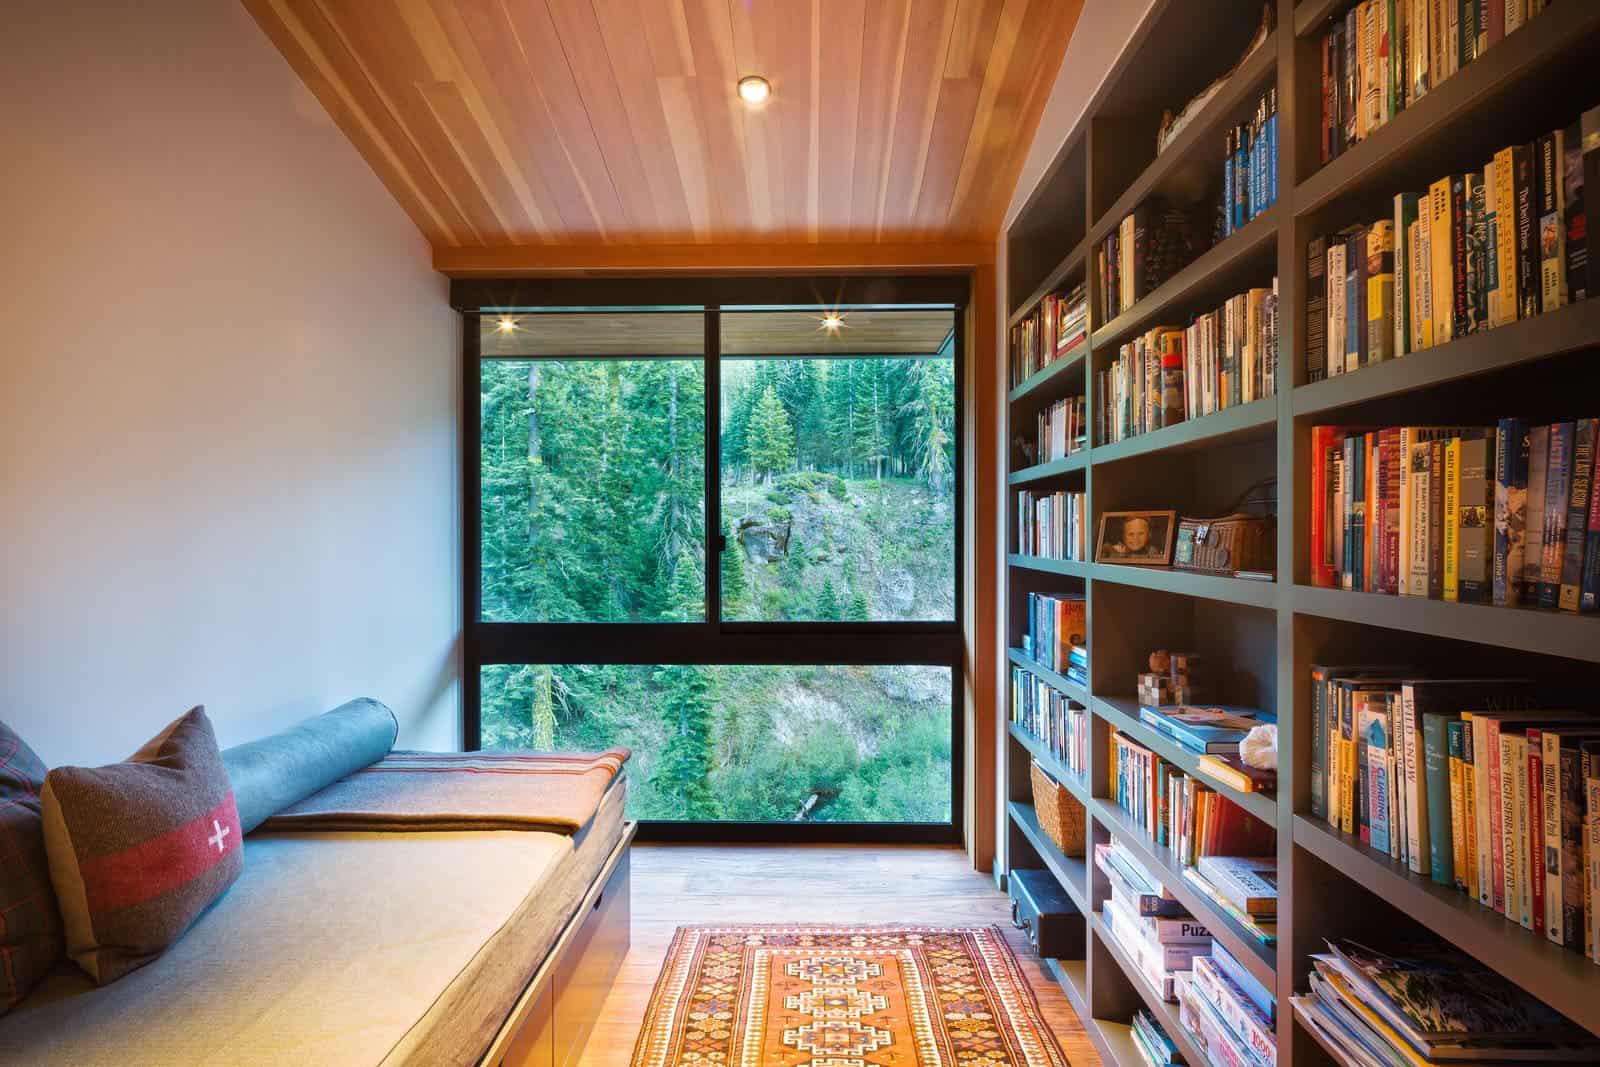 ski-cabin-home-library